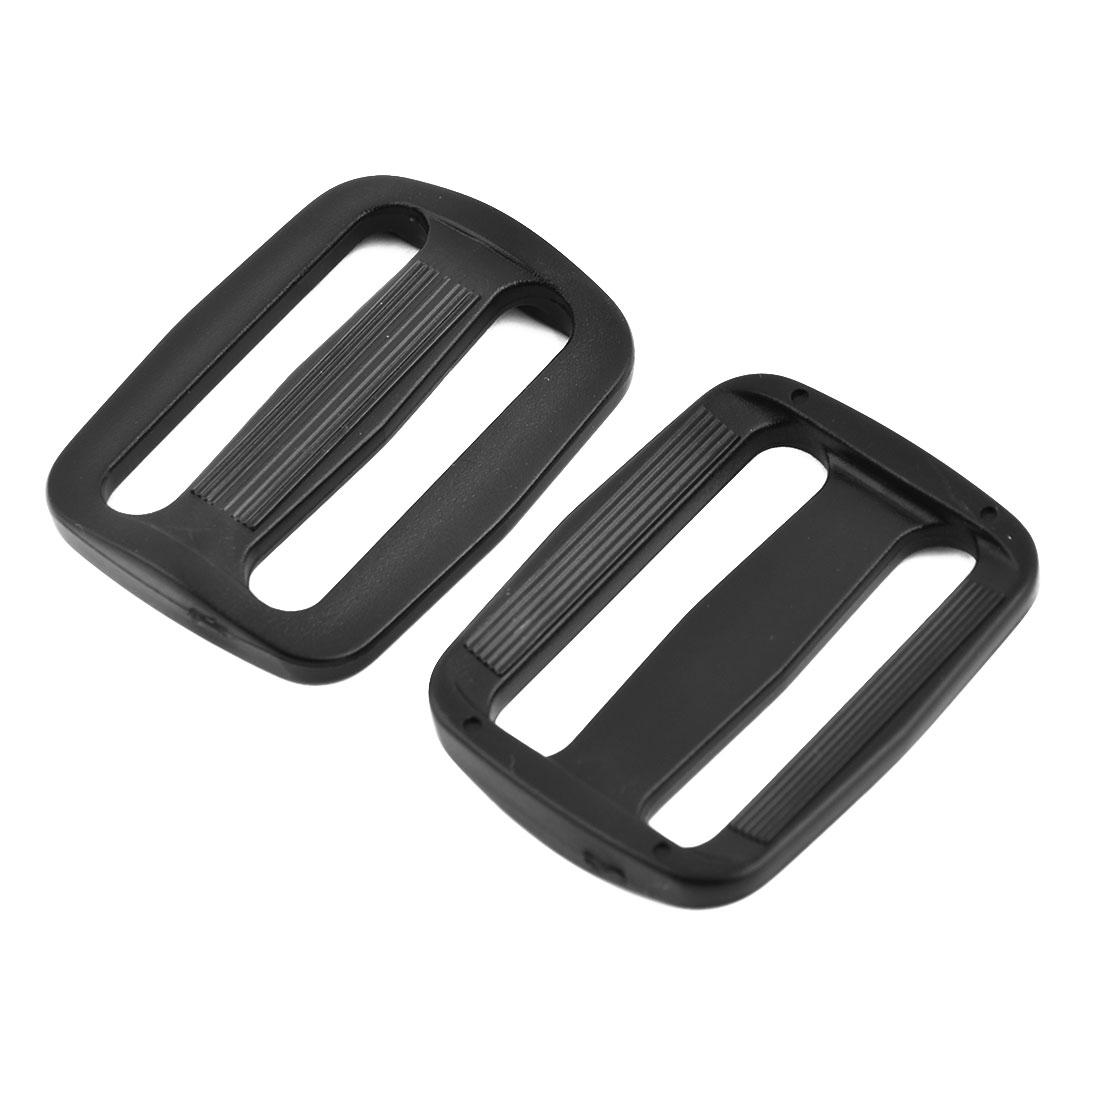 Plastic Adjustable Backpack Strap Tri Glide Tension Connect Buckle Black 4 Pcs